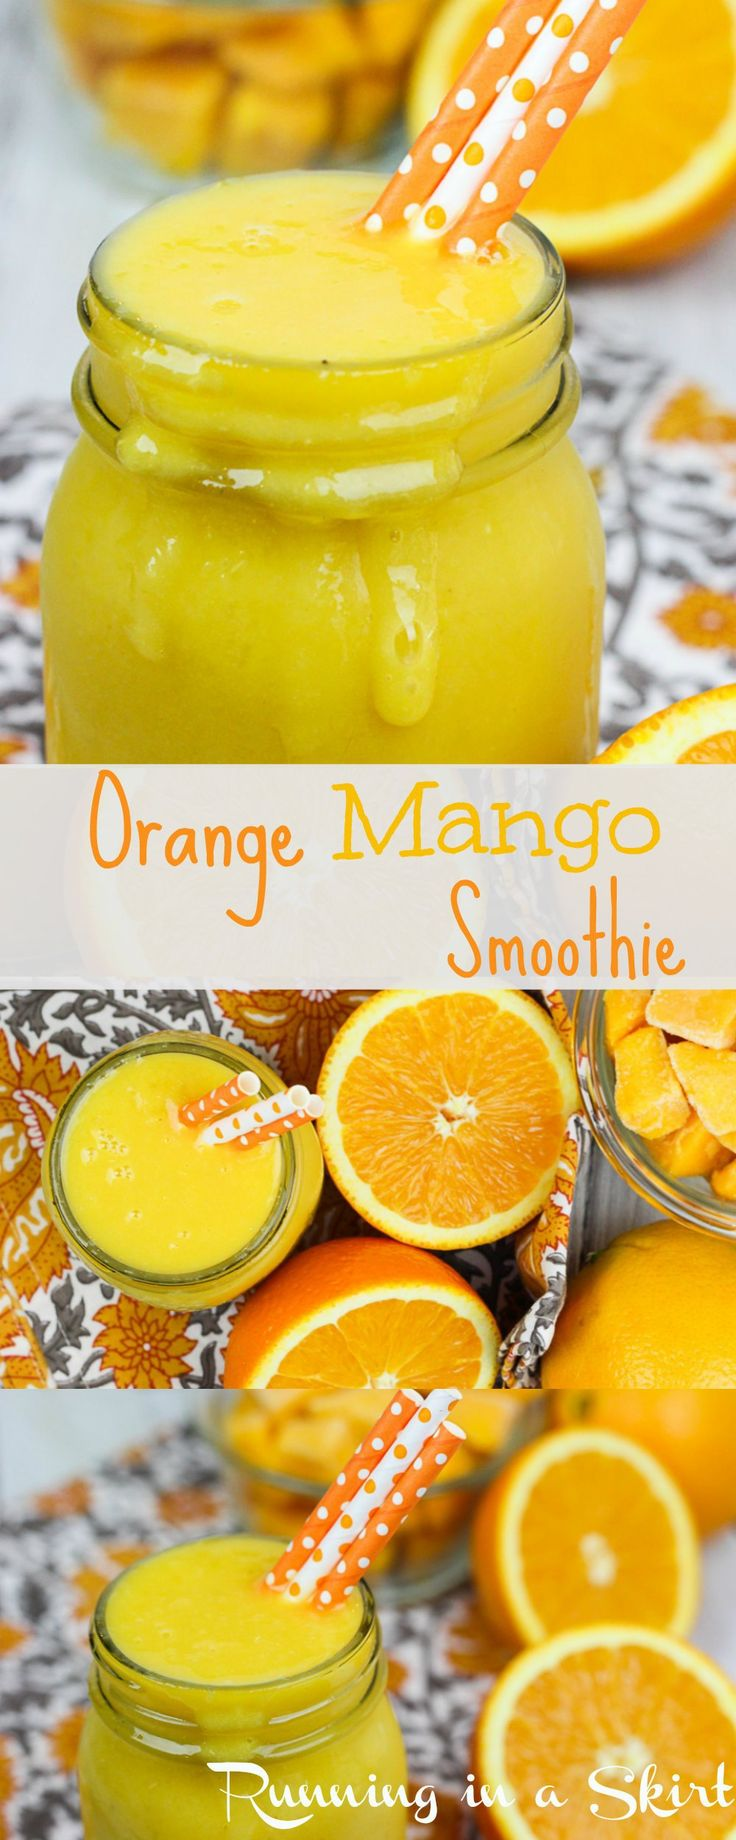 6 Refreshing Smoothie Recipes